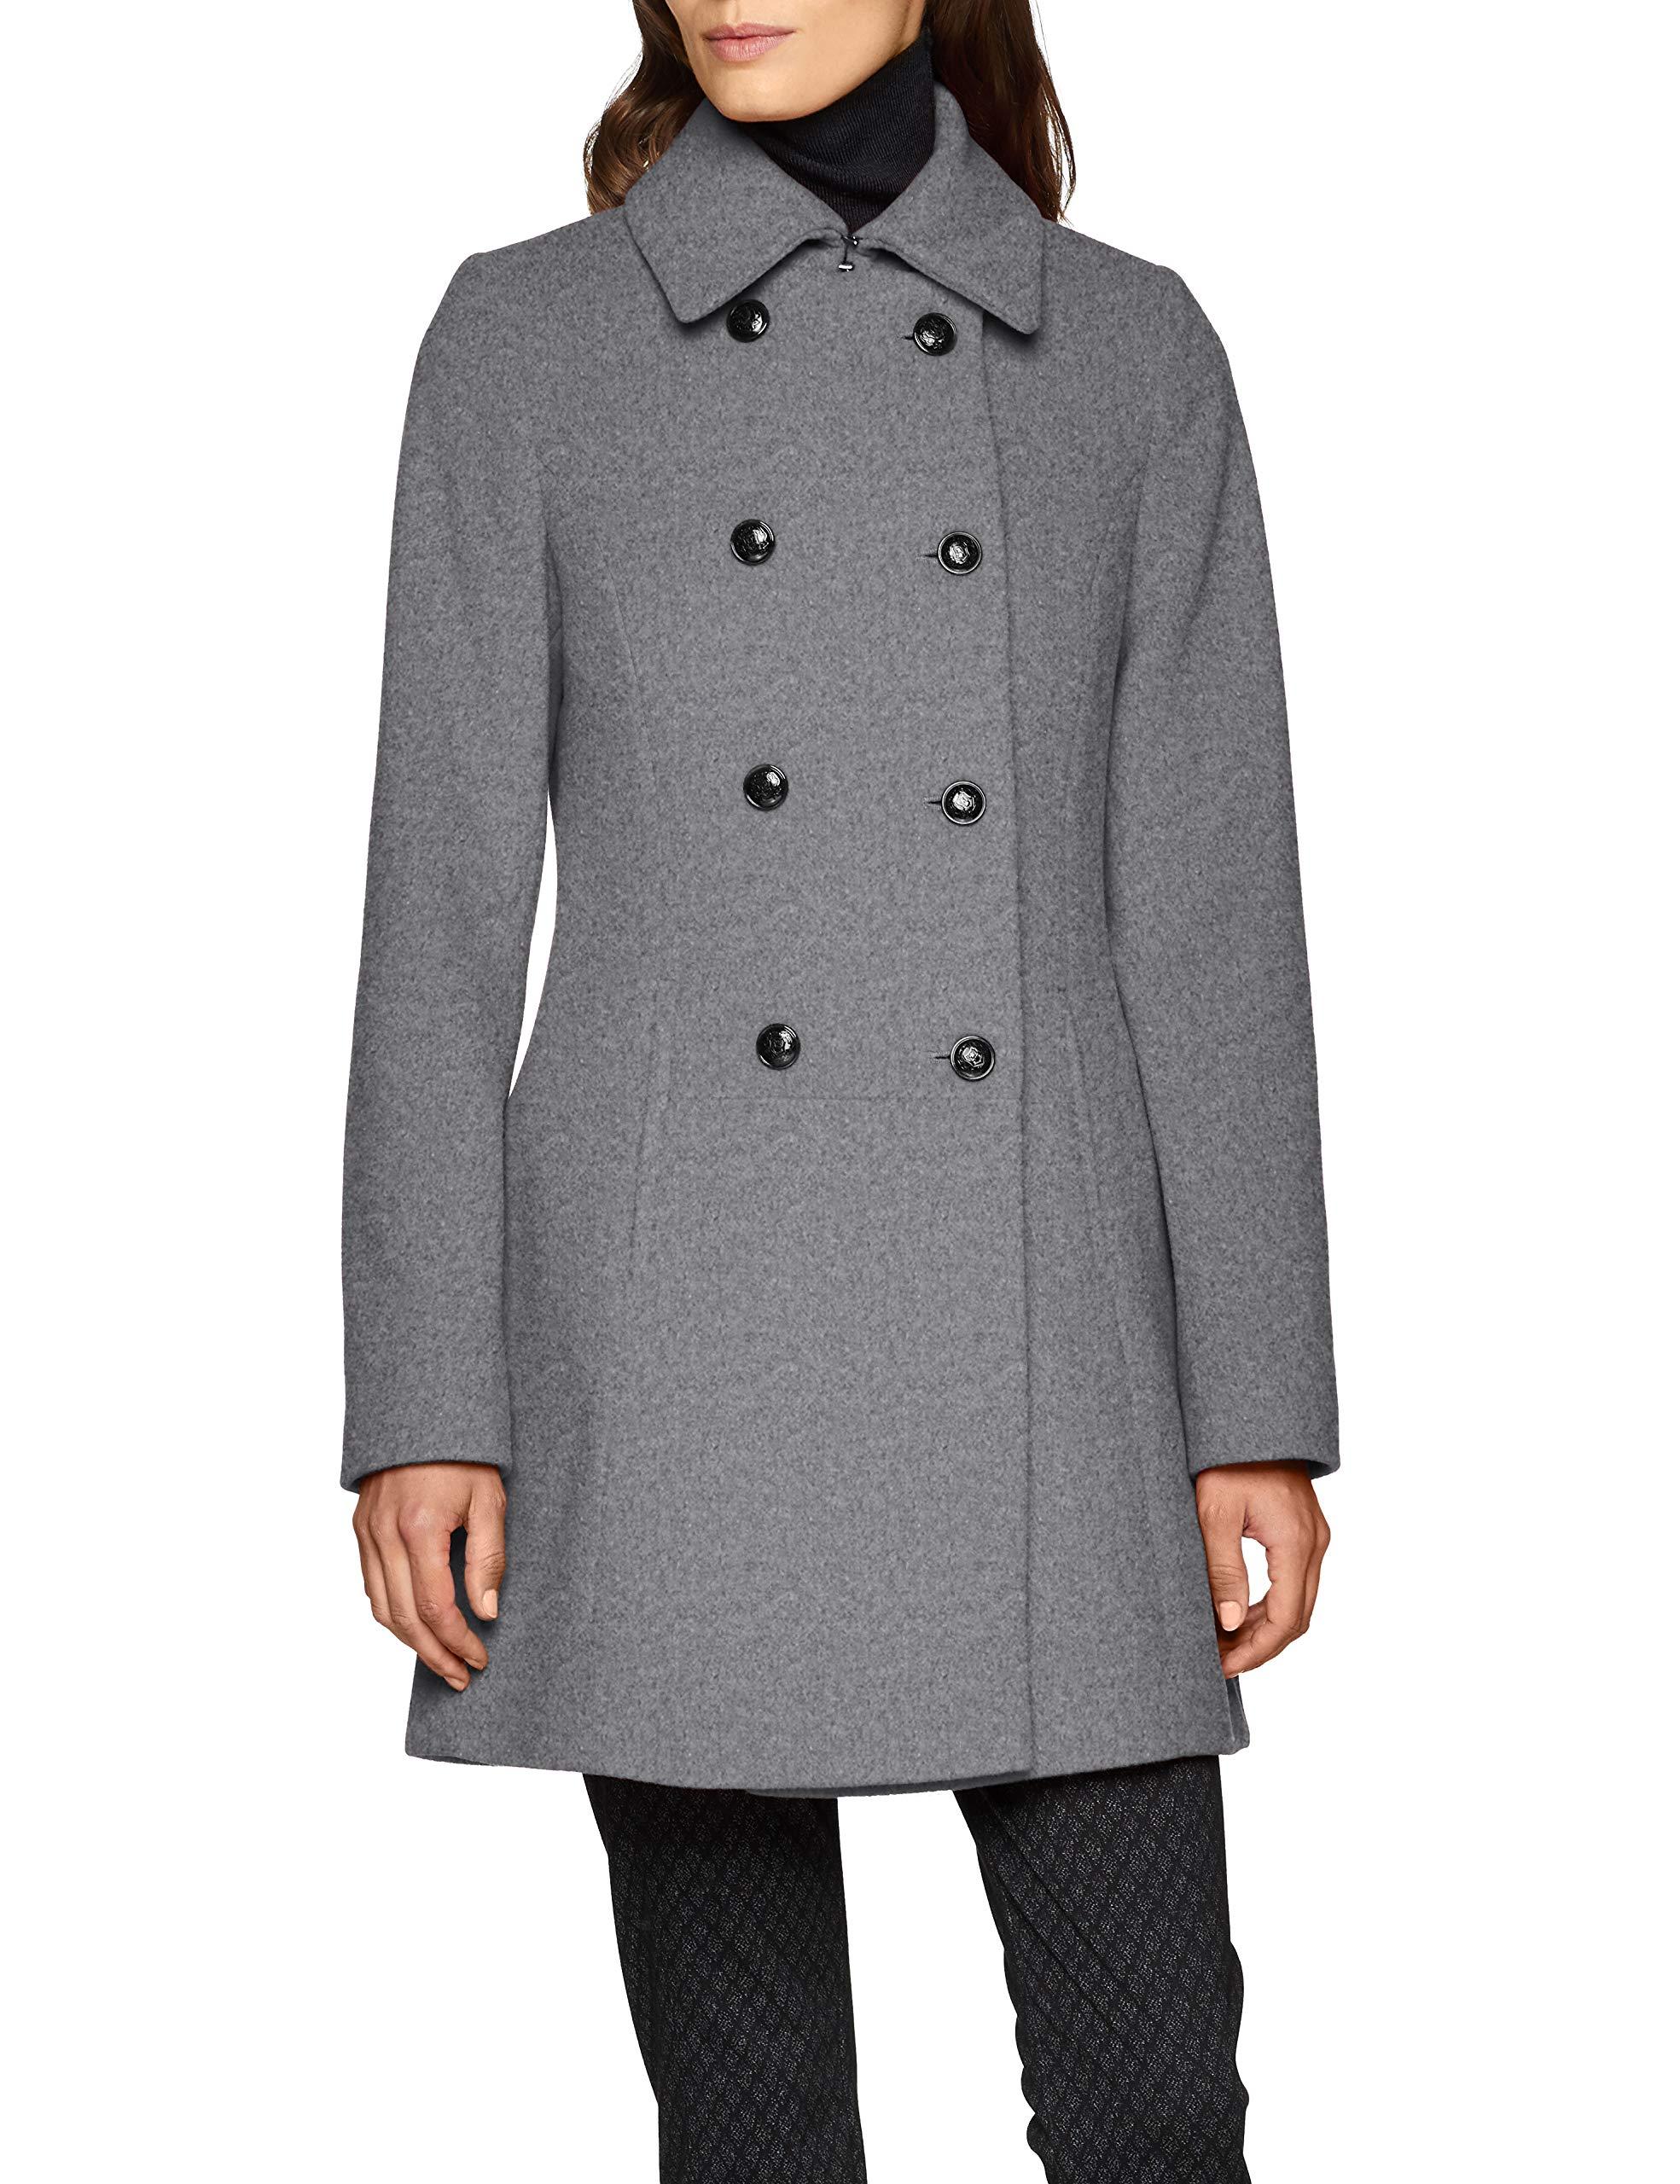 Hechter Daniel Coat ManteauGrisgrey Femme Wool Melange 93042 mn0wNOv8